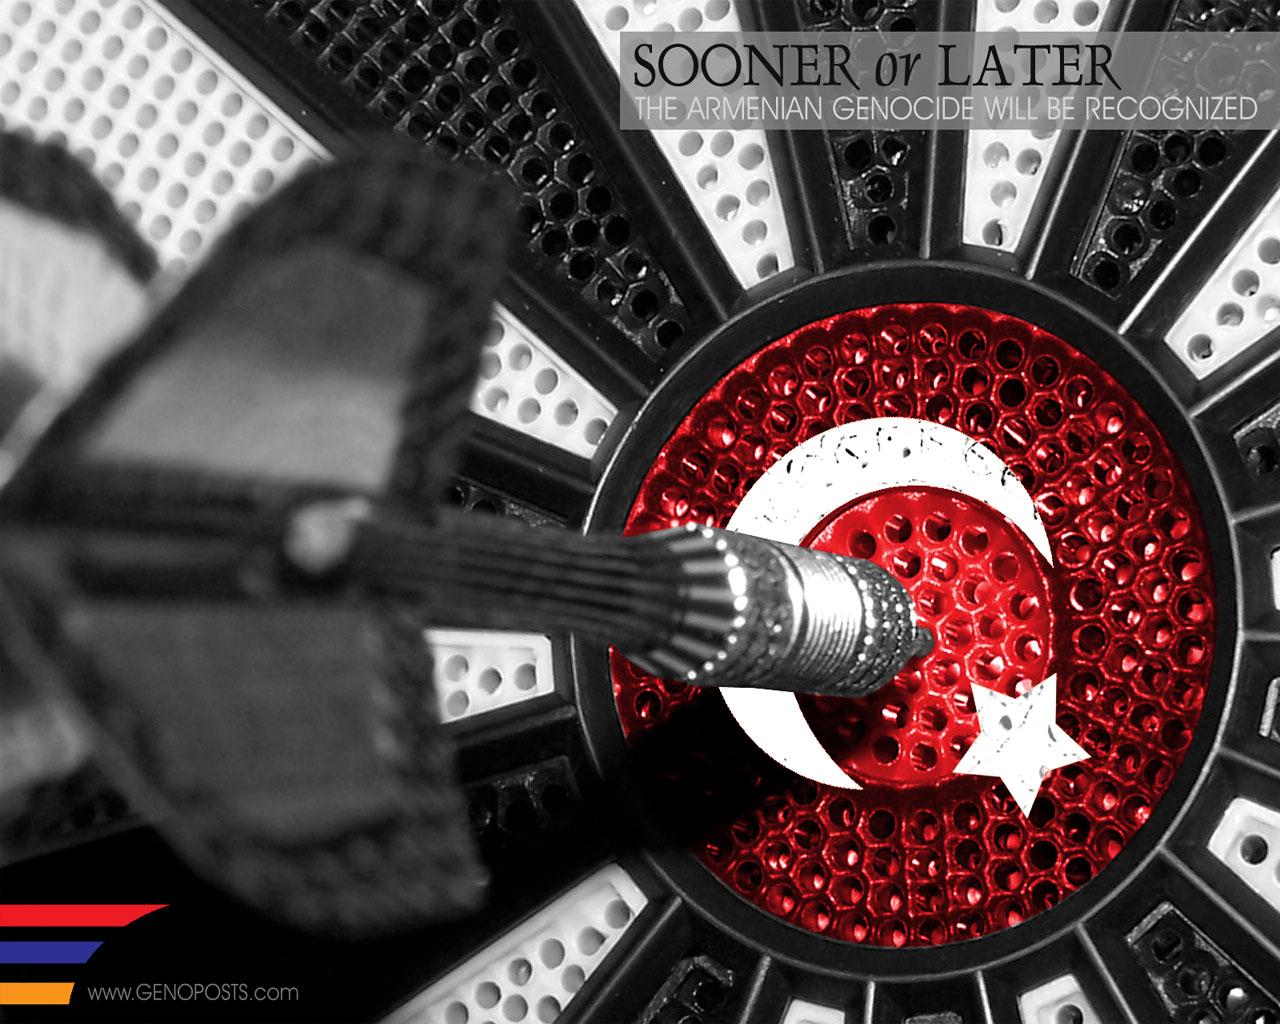 soonerORlater